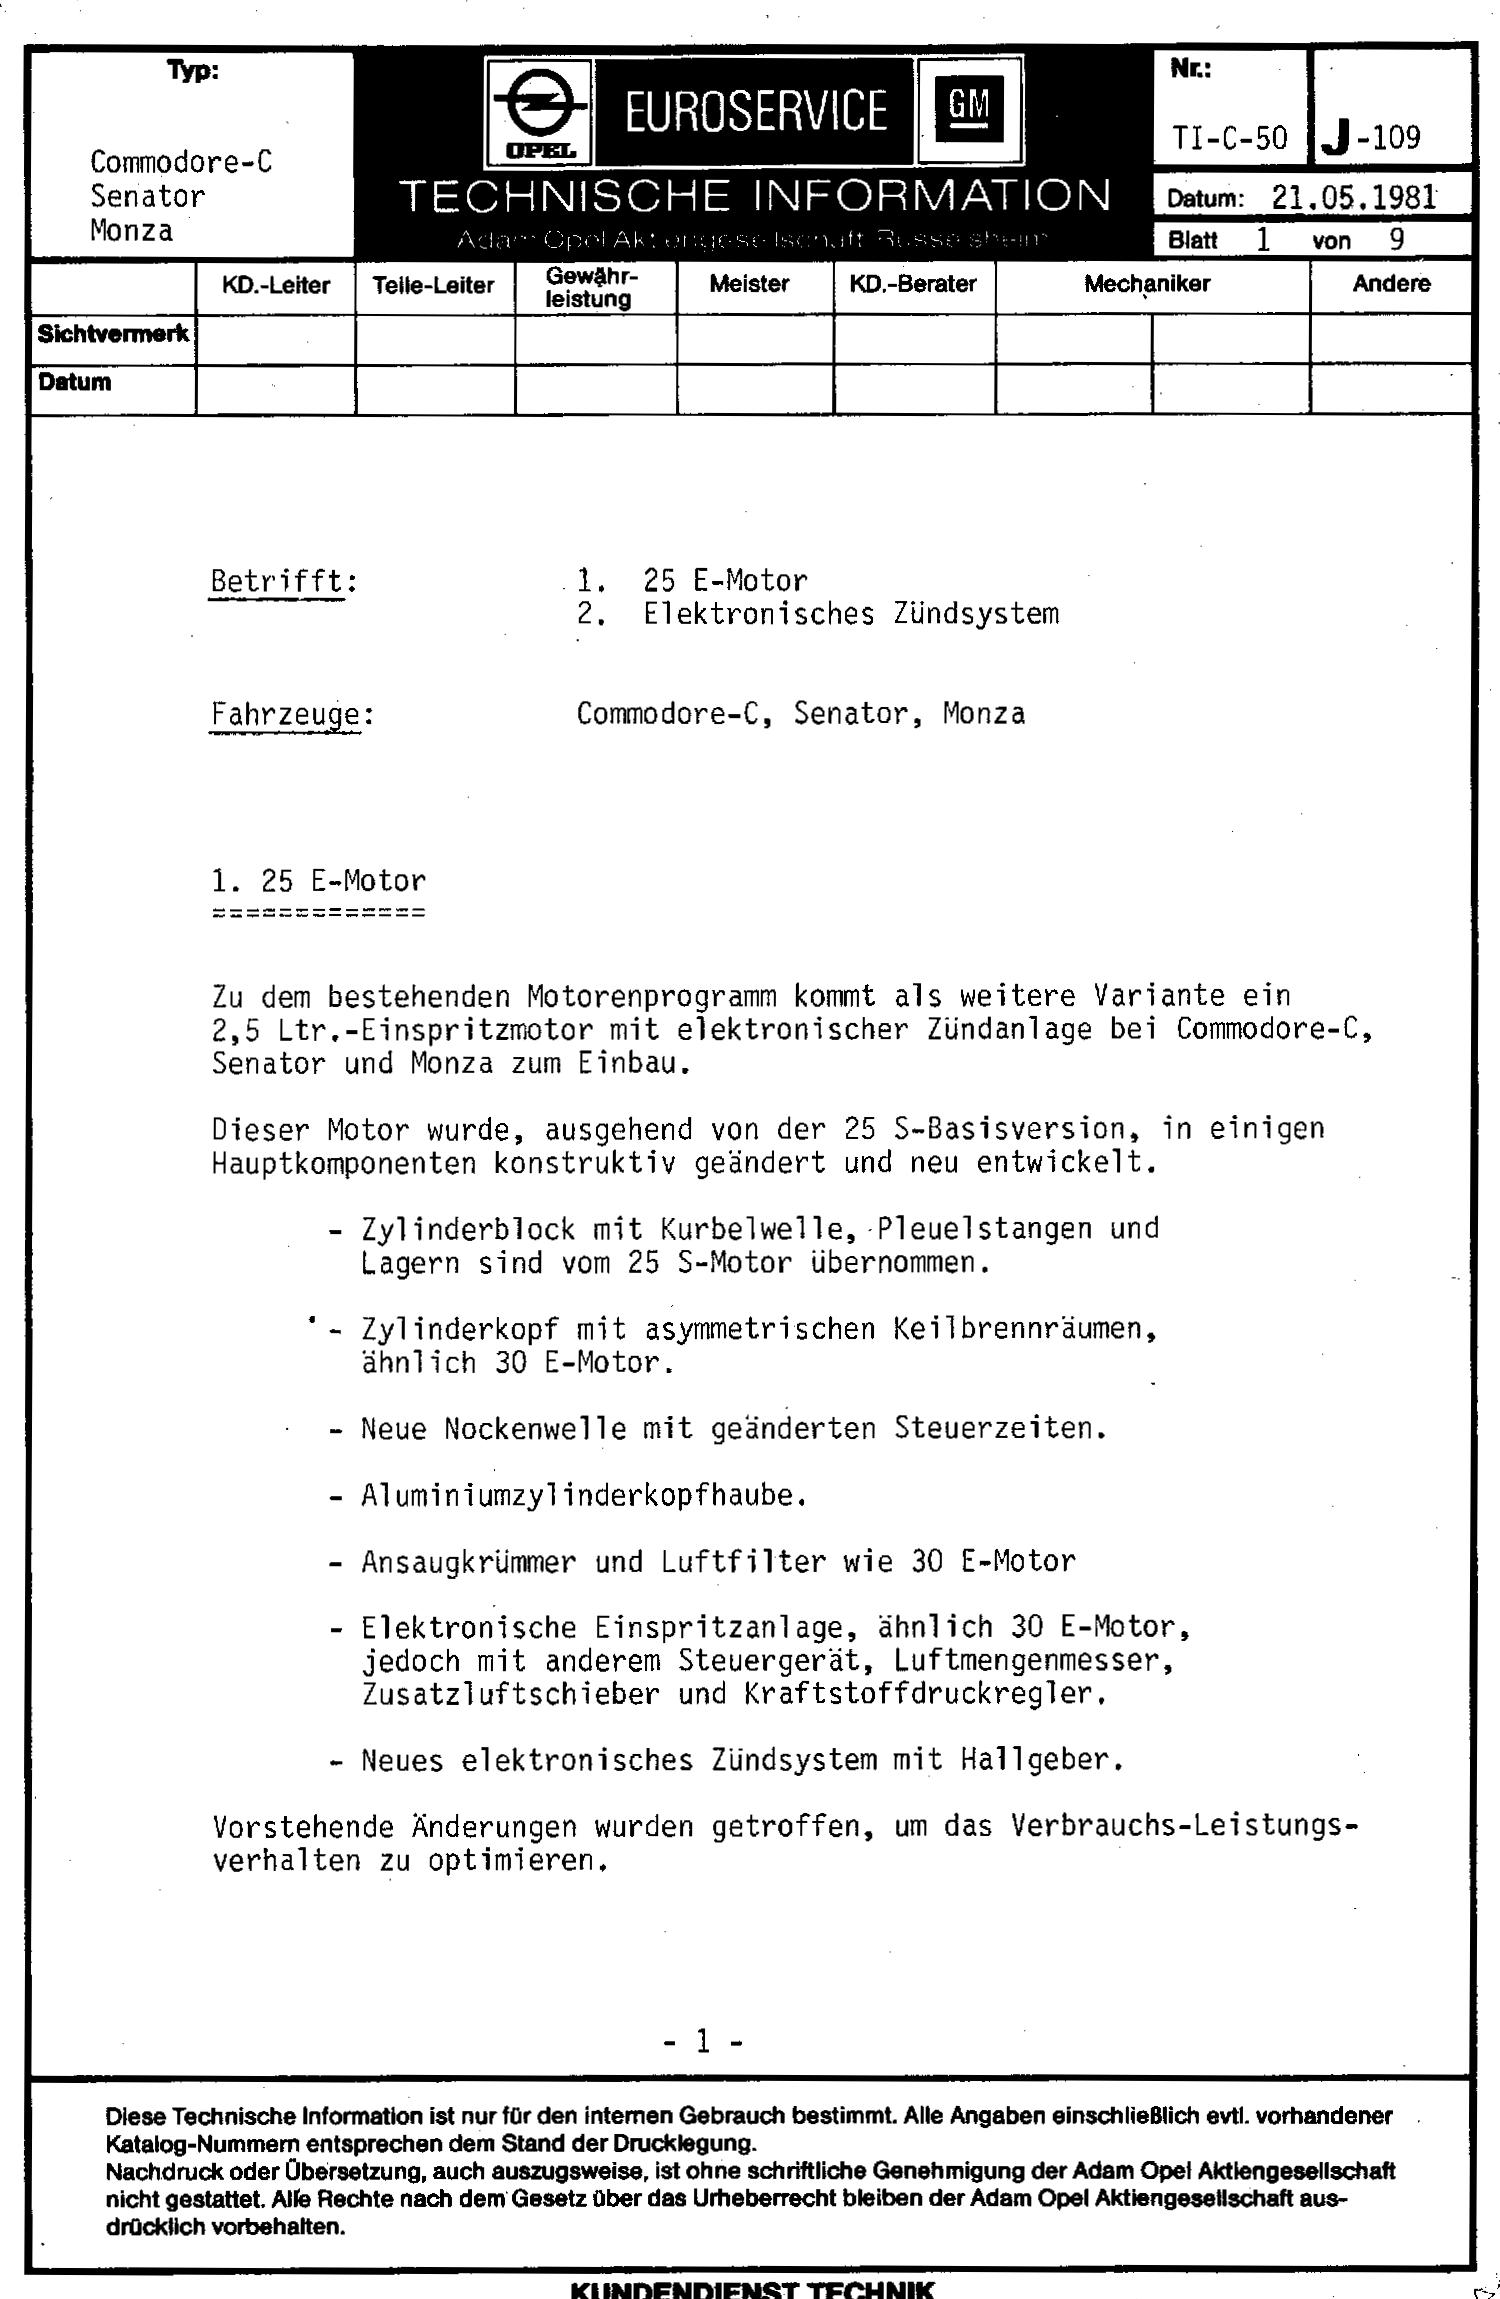 Technische Daten Commodore C 2.5 S - Wissenswertes über den Opel ...